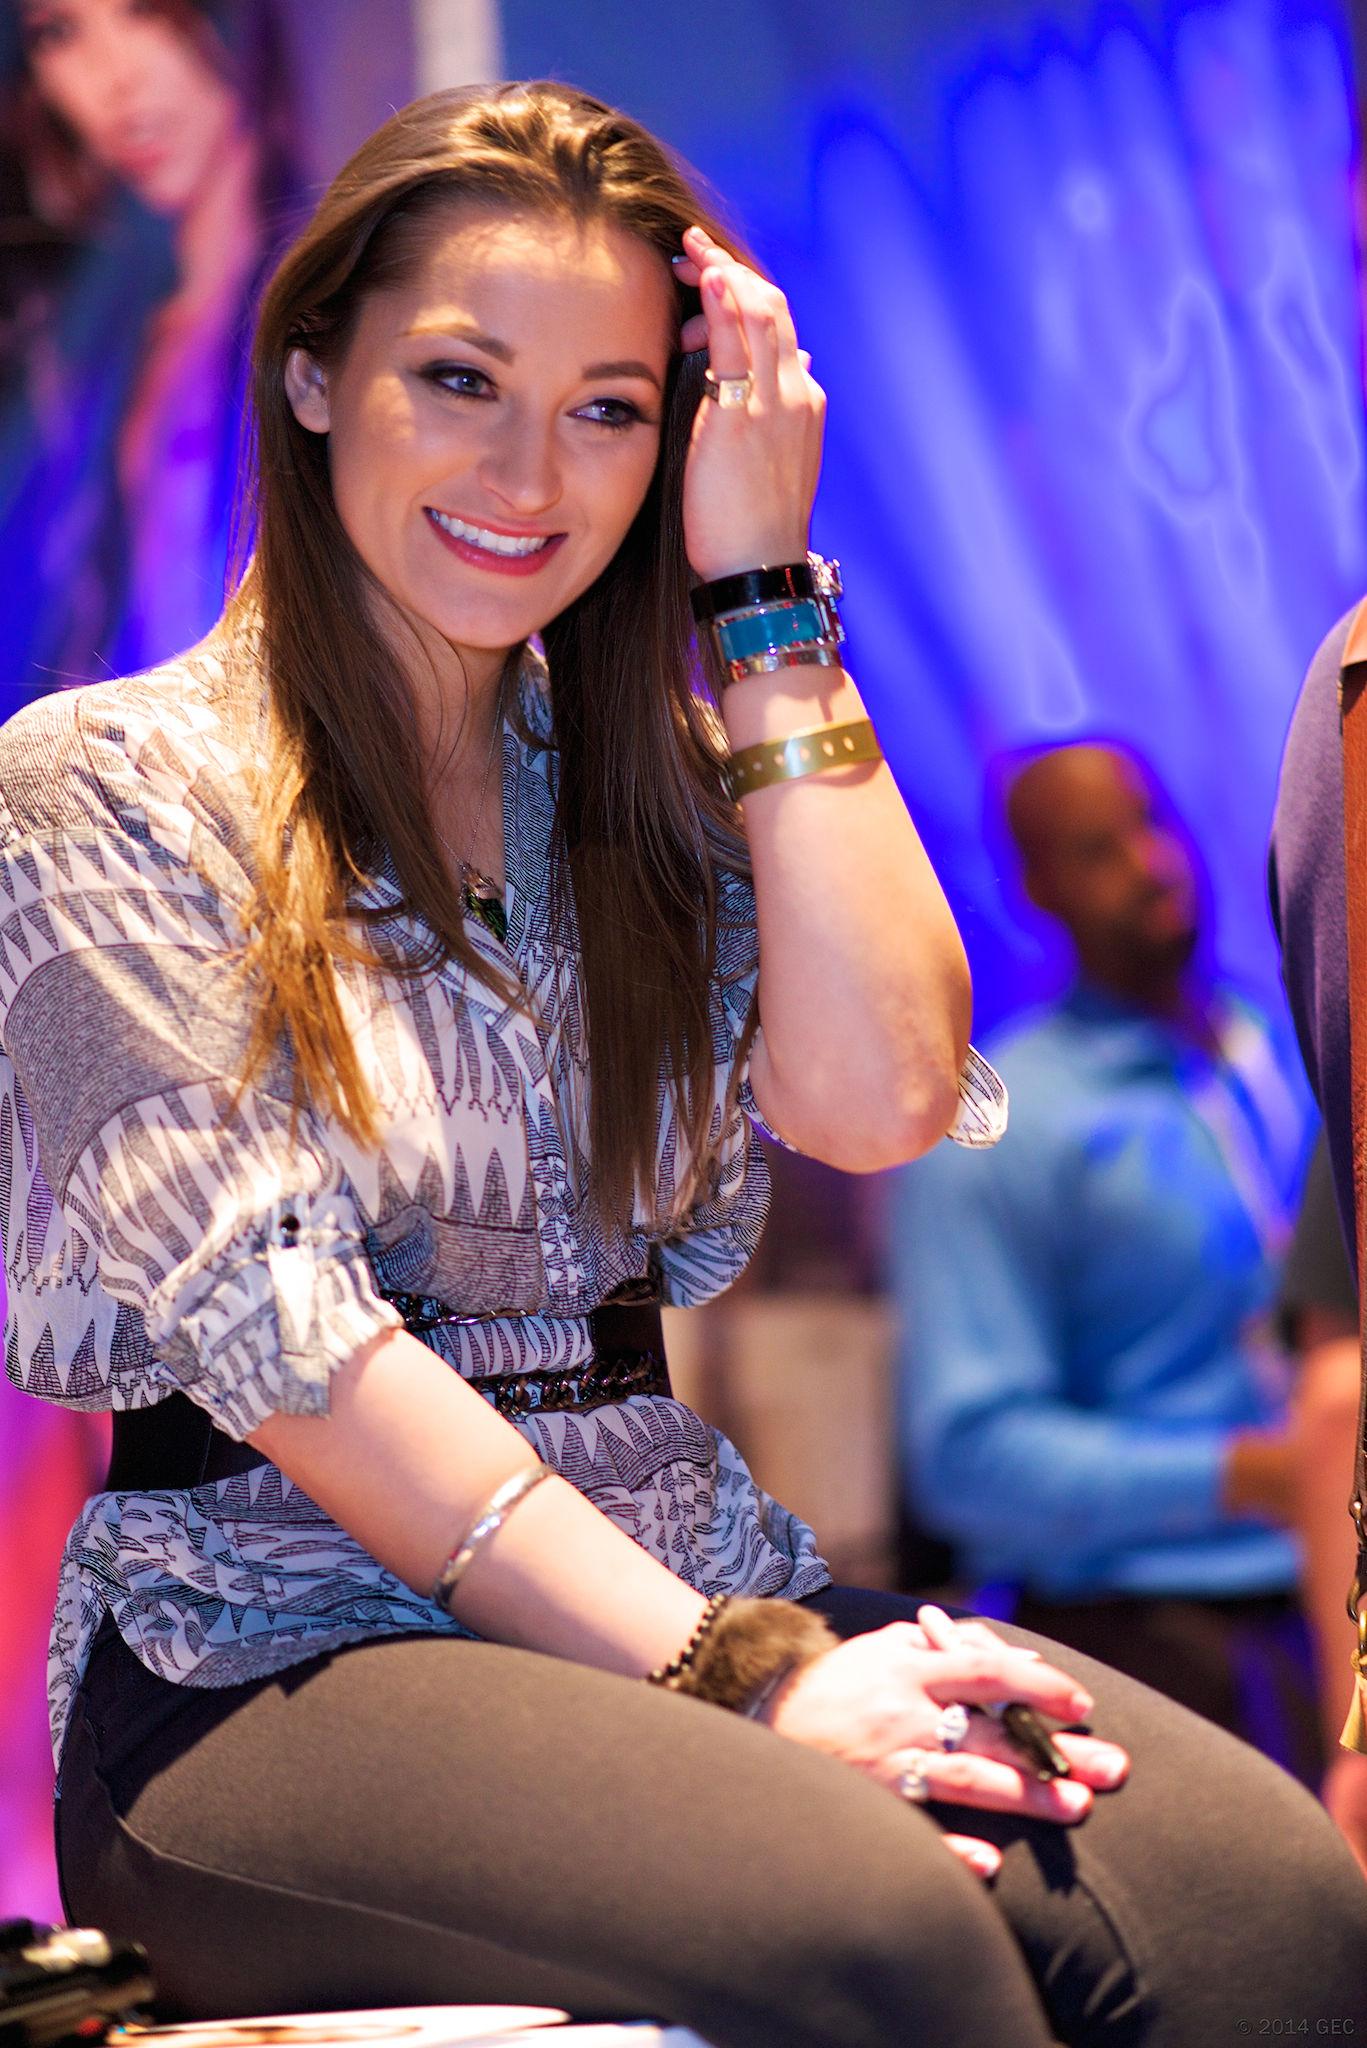 Photo of Dani Daniels: American pornographic actress